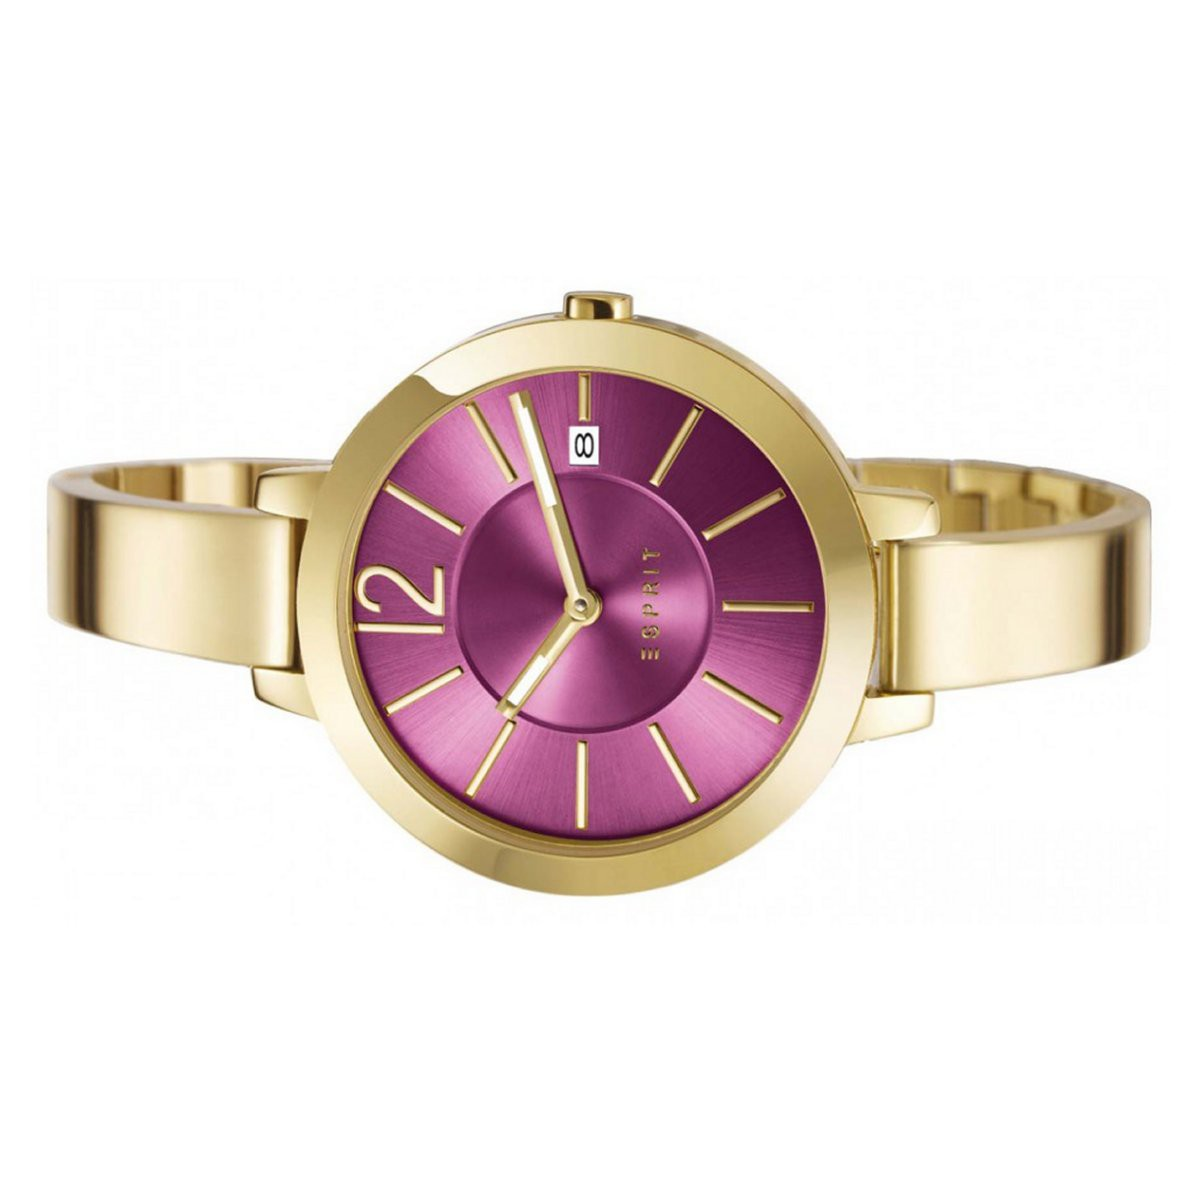 Esprit Uhr Edelstahl Gold Es107242004 Damen Amelia Armbanduhr Pnk0w8O